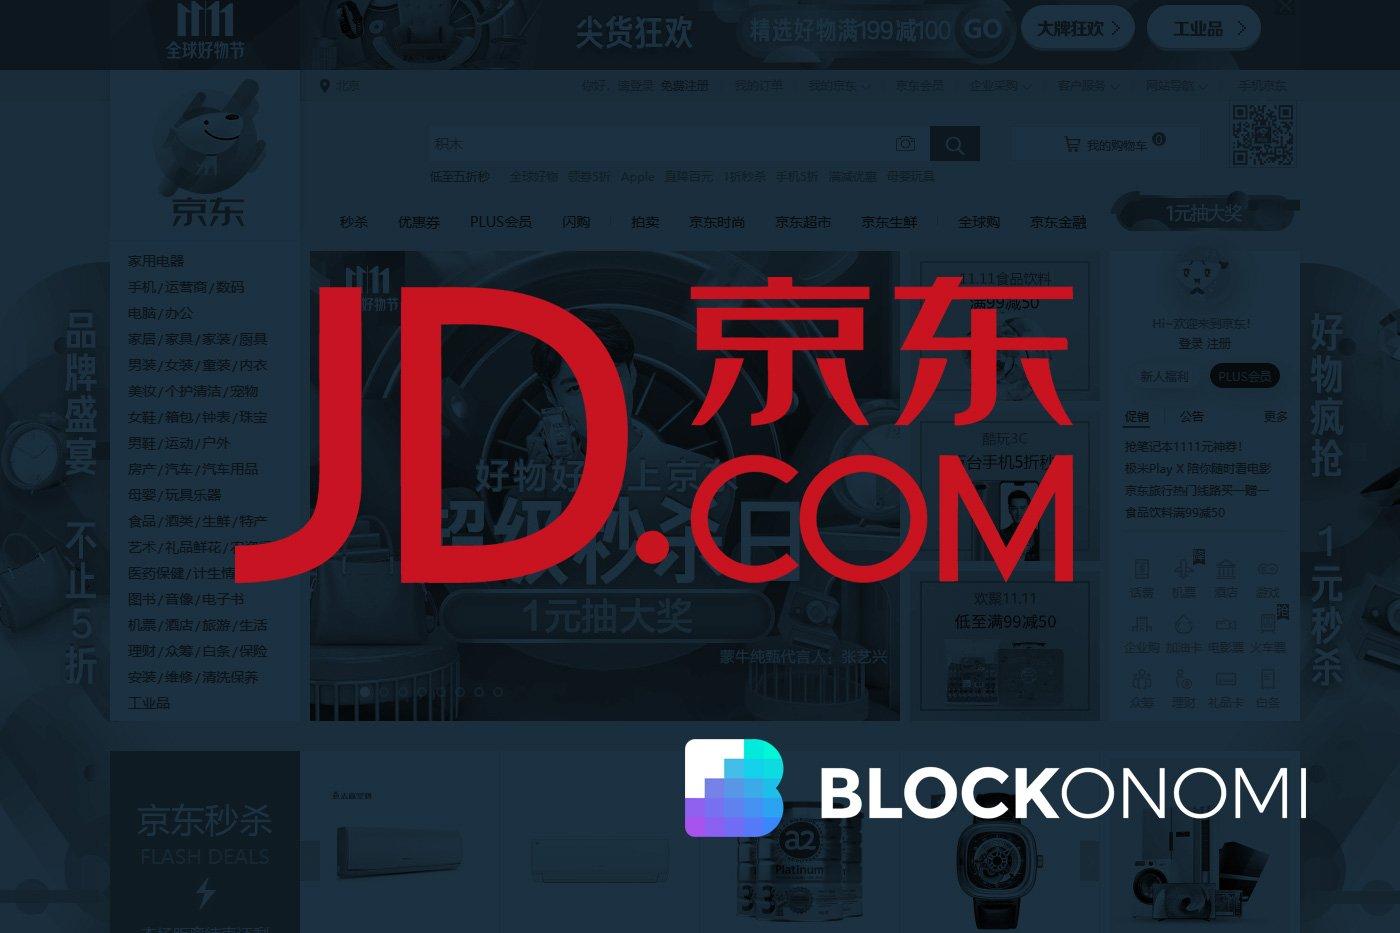 JD.com Blockchain